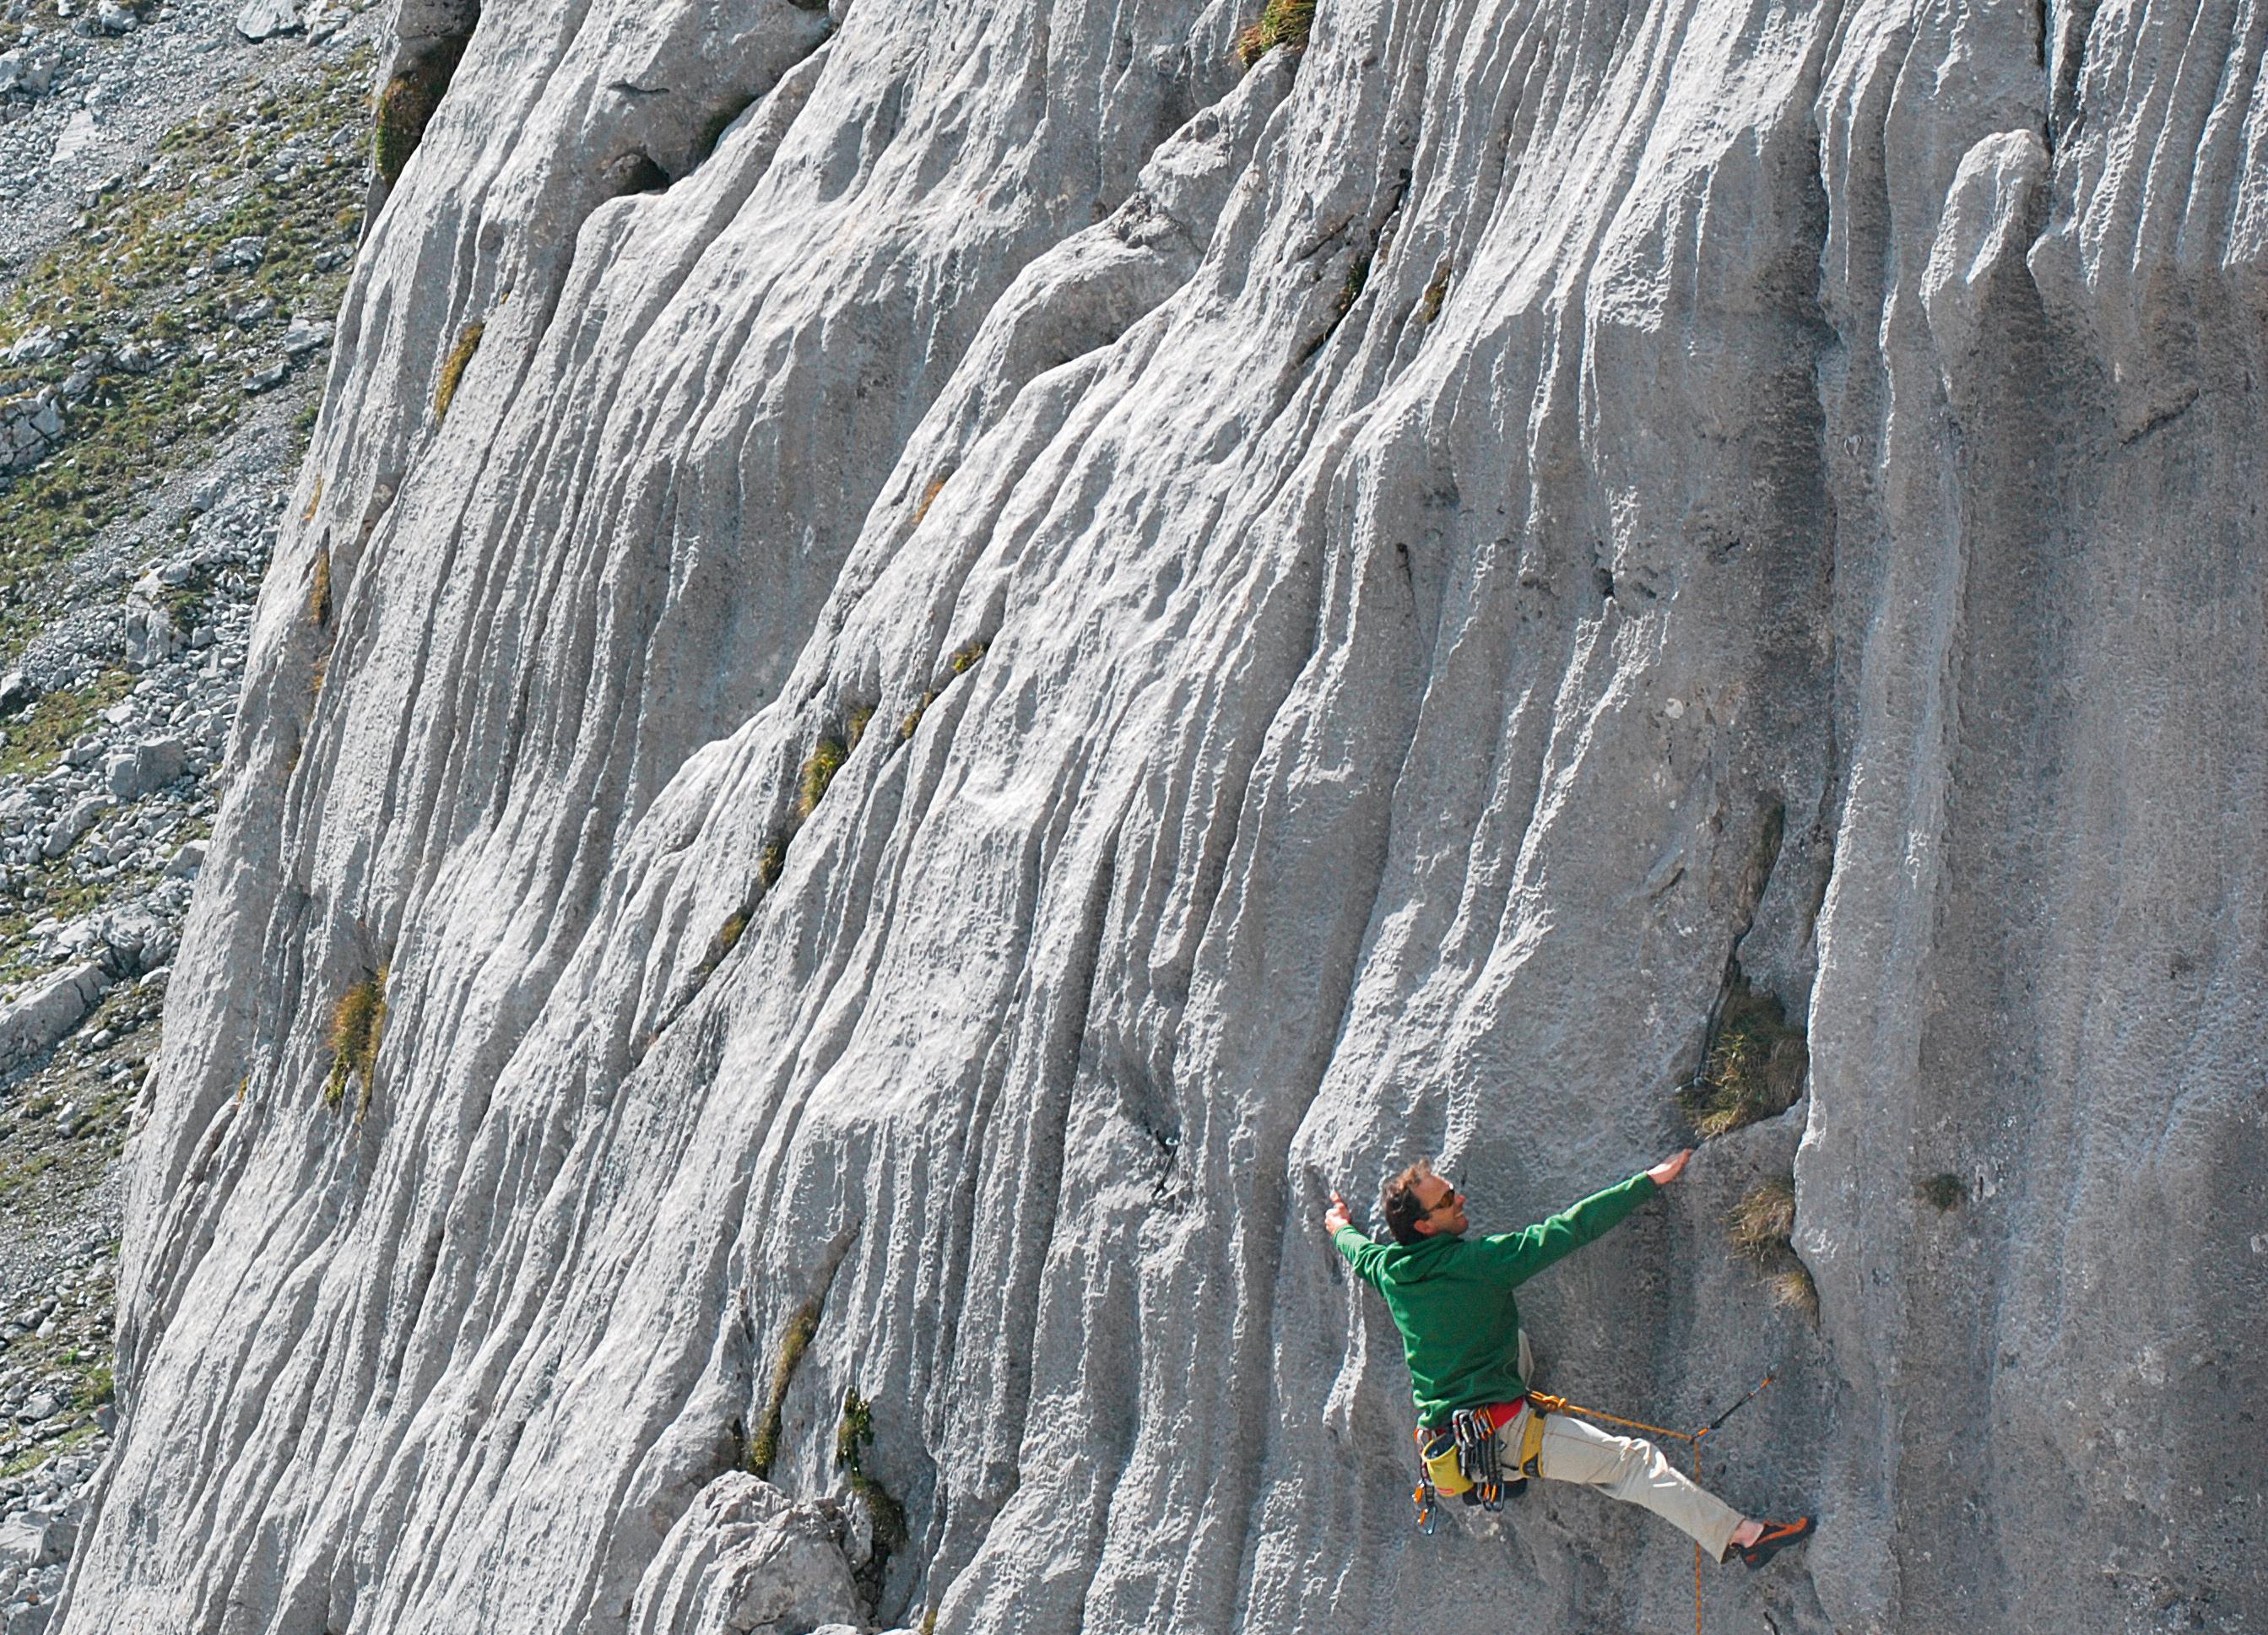 Akkurate Felsfrisur beim klettern in Tirol: Peter Frei in »Lenticularis « (VI–), Hochfeldernalm